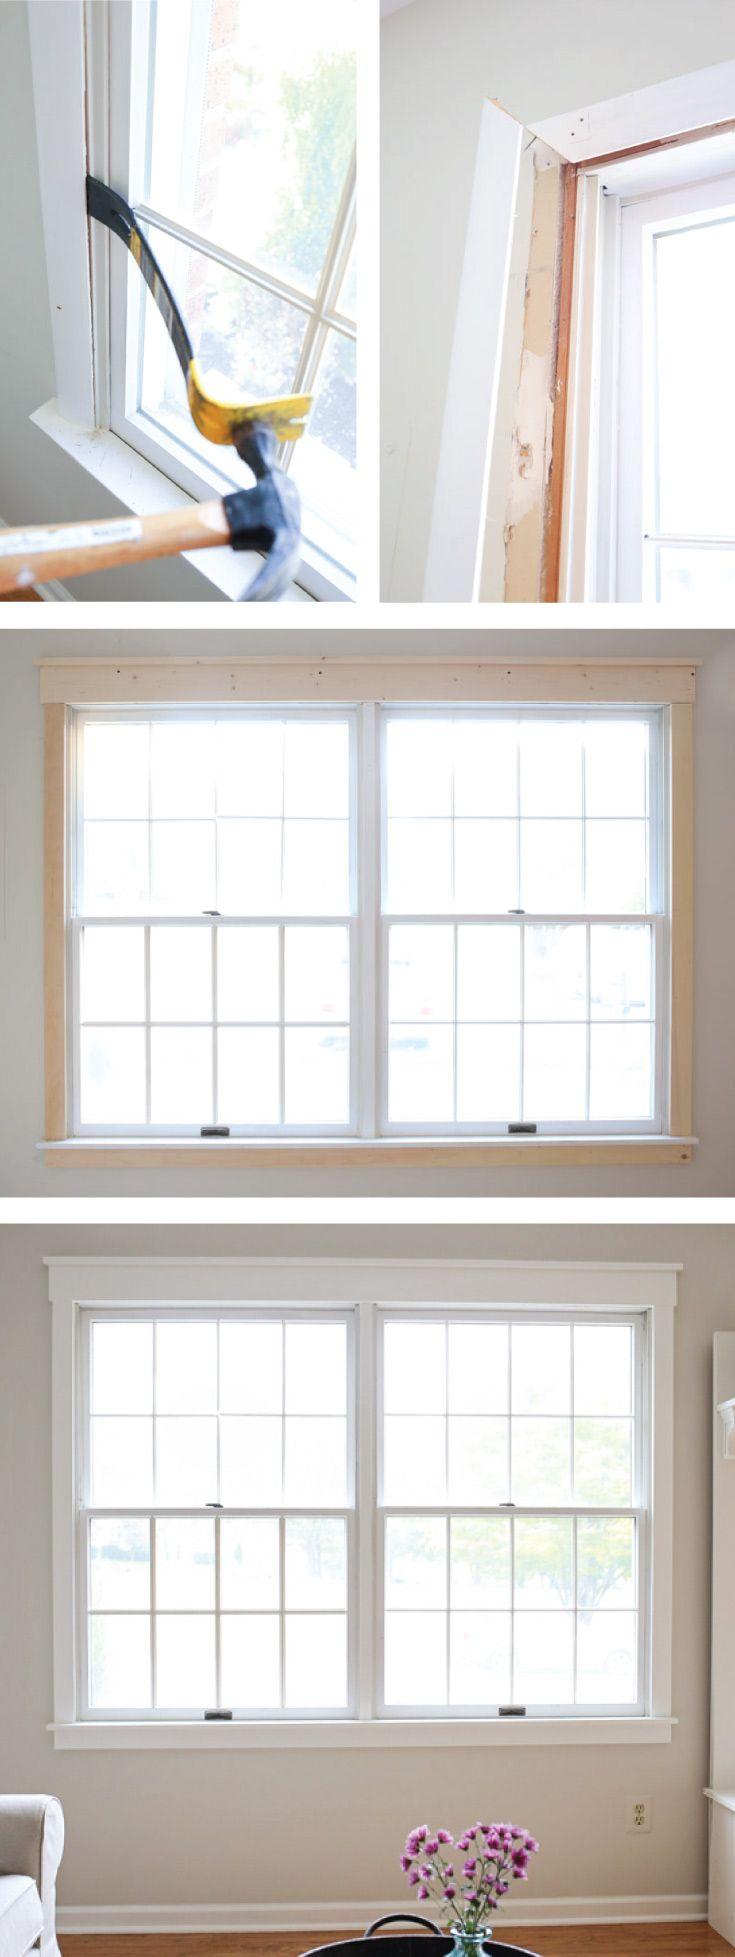 Diy interior window trim - How To Update Window Trim